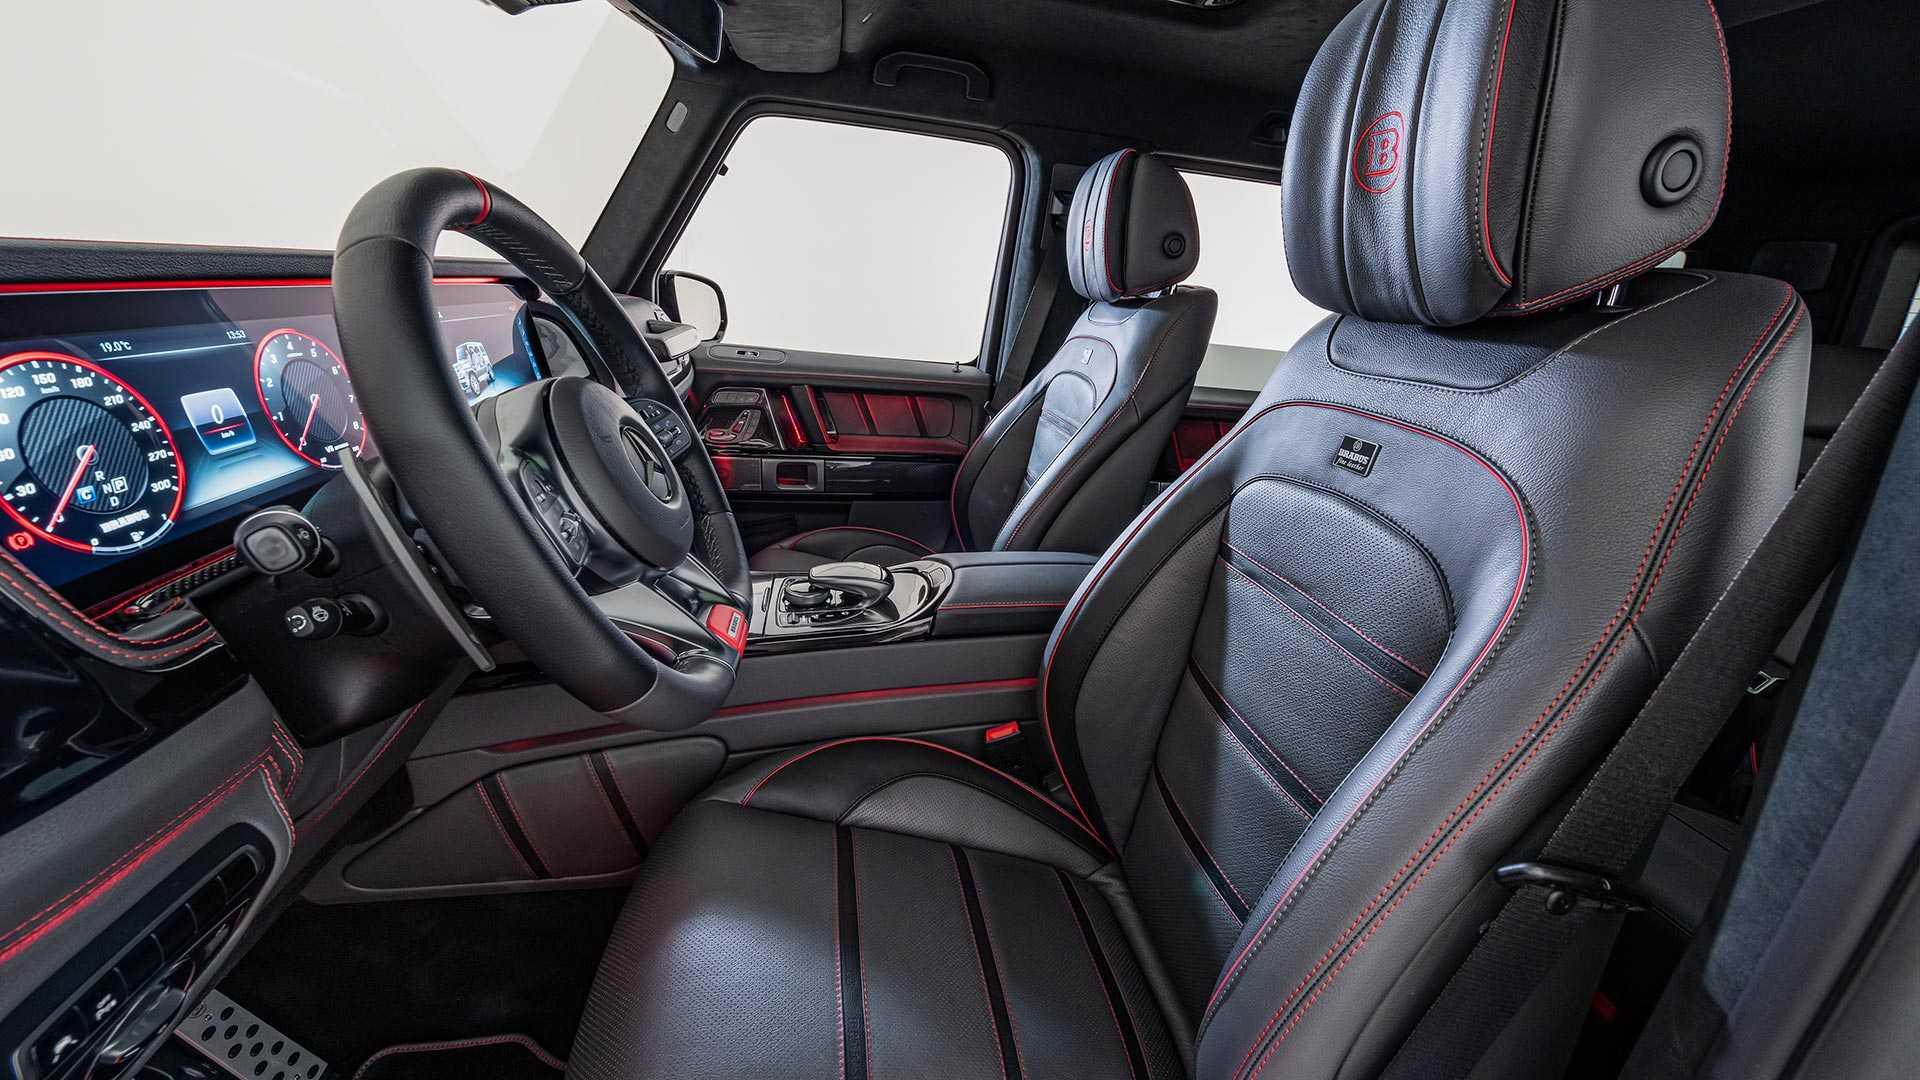 Brabus Mercedes-AMG G63 Black OPS